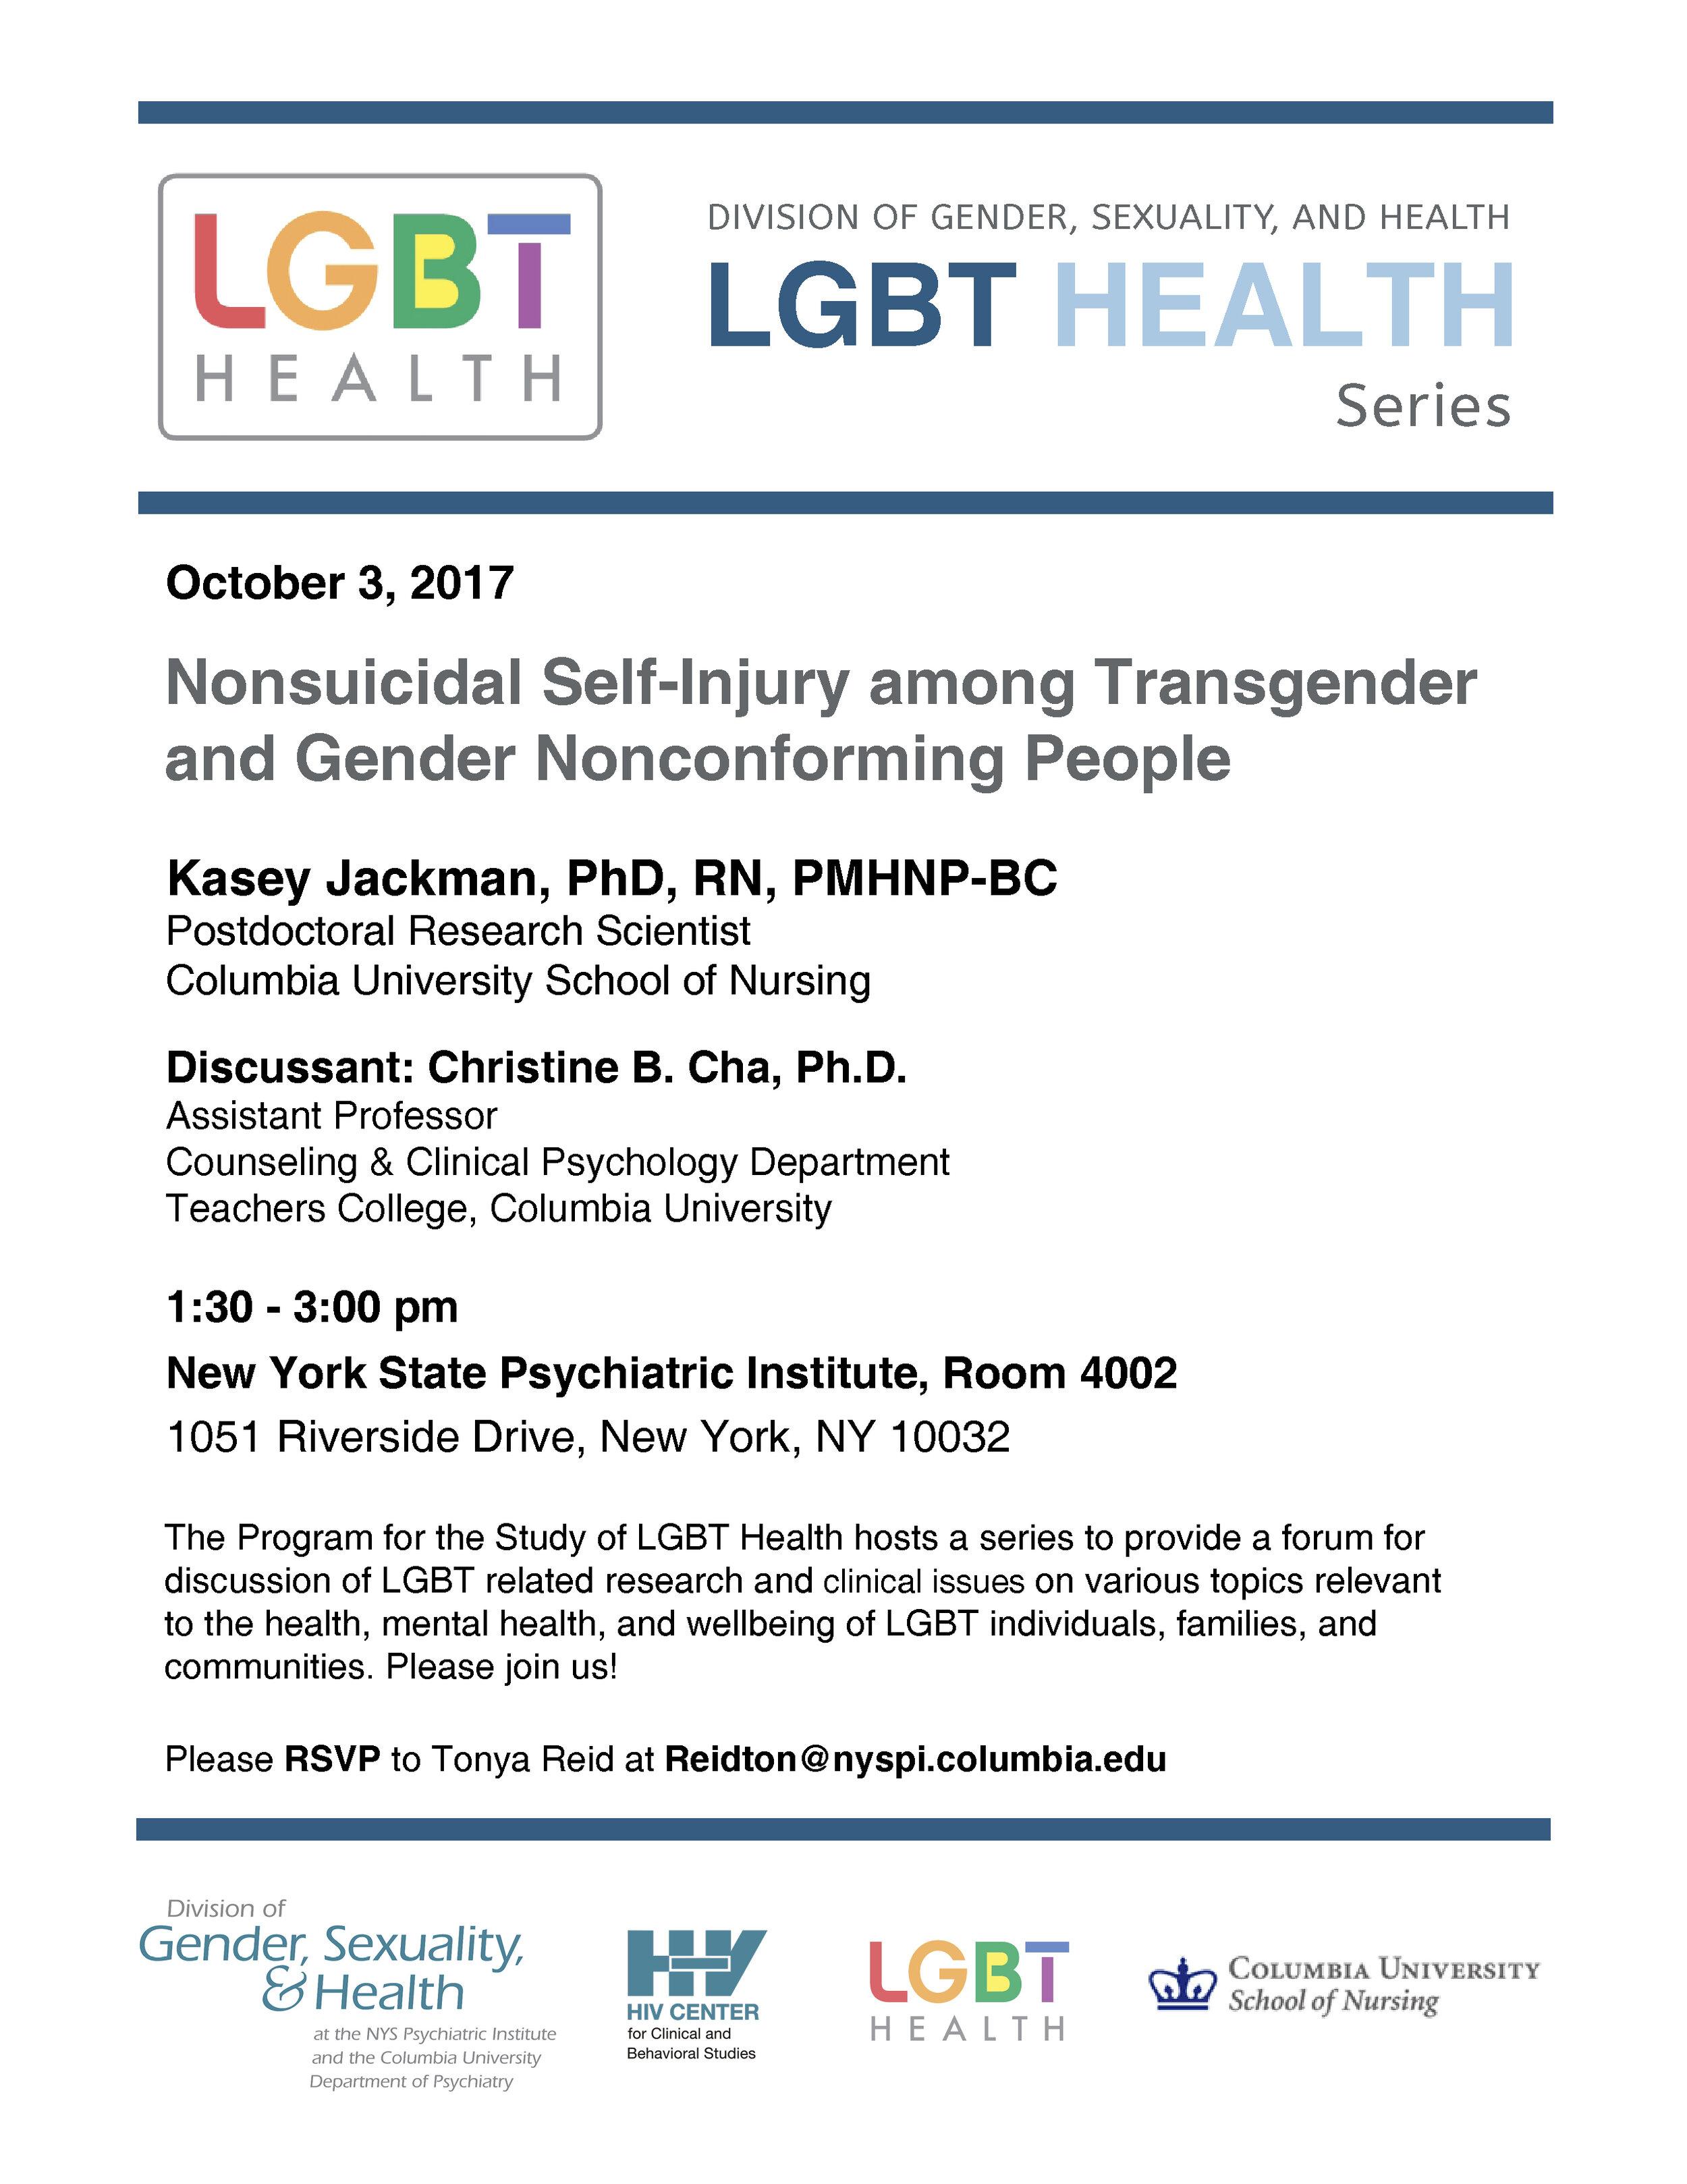 LGBT Health Series Oct 3 2017.jpg